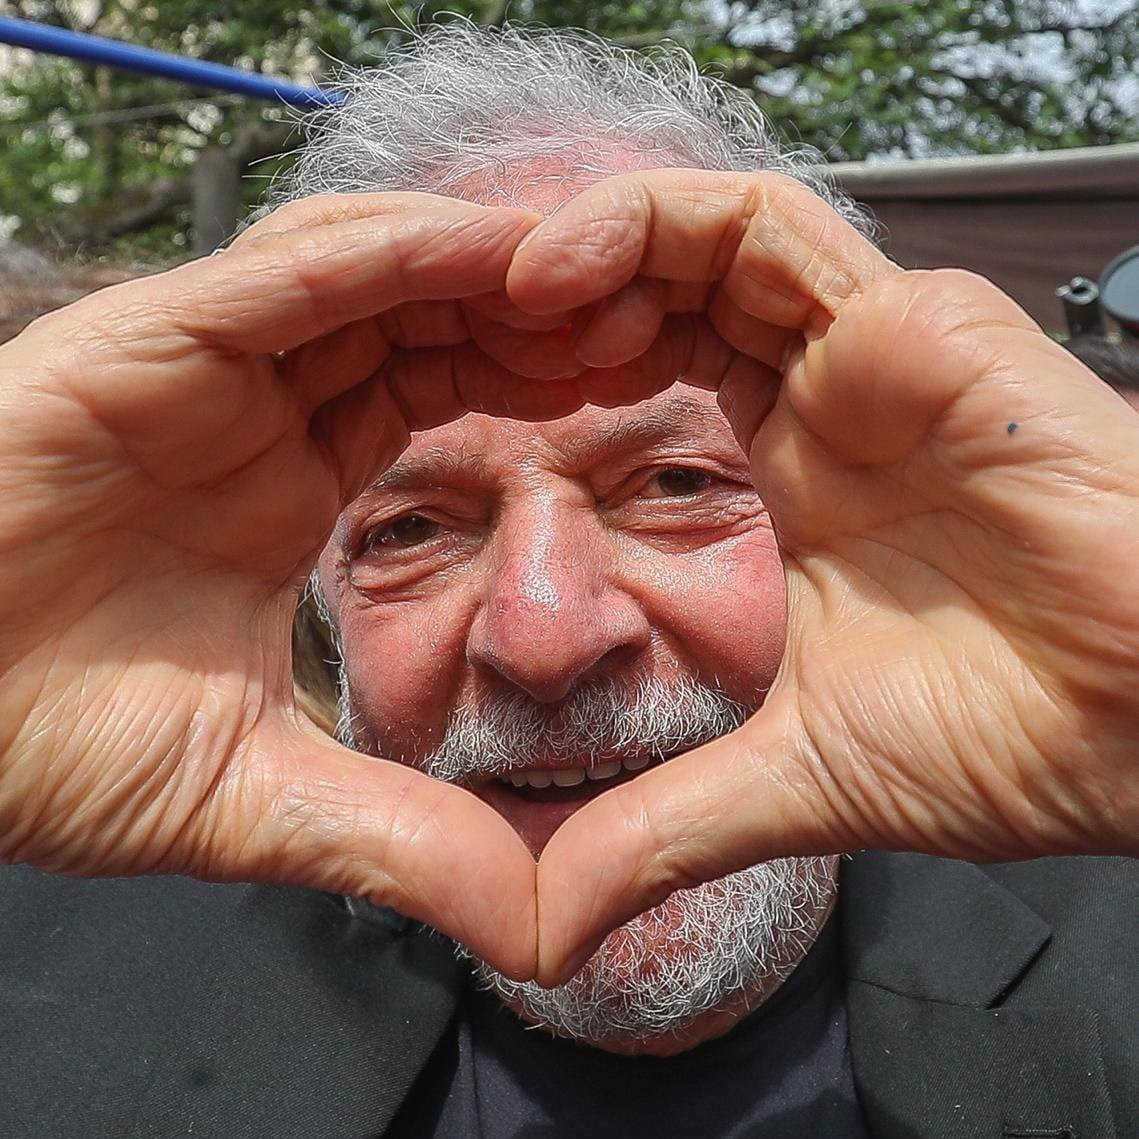 Marcelo Zero: Medo de Lula é medo da democracia real e inclusiva e, sobretudo, ódio ao povo